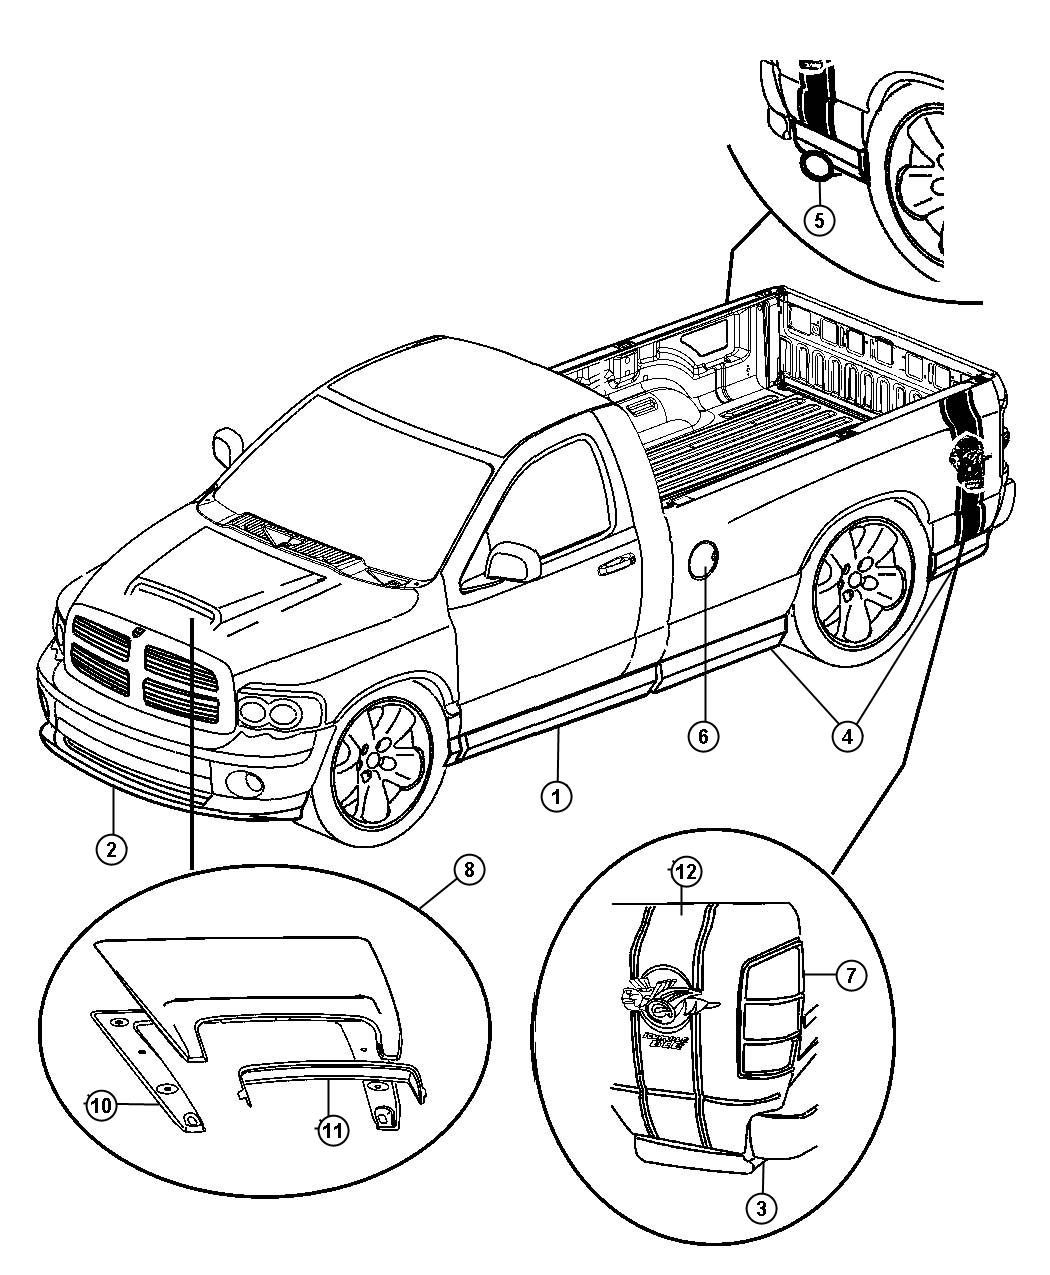 Torision Bar Dodge Grand Caravan Rear Suspension Diagram